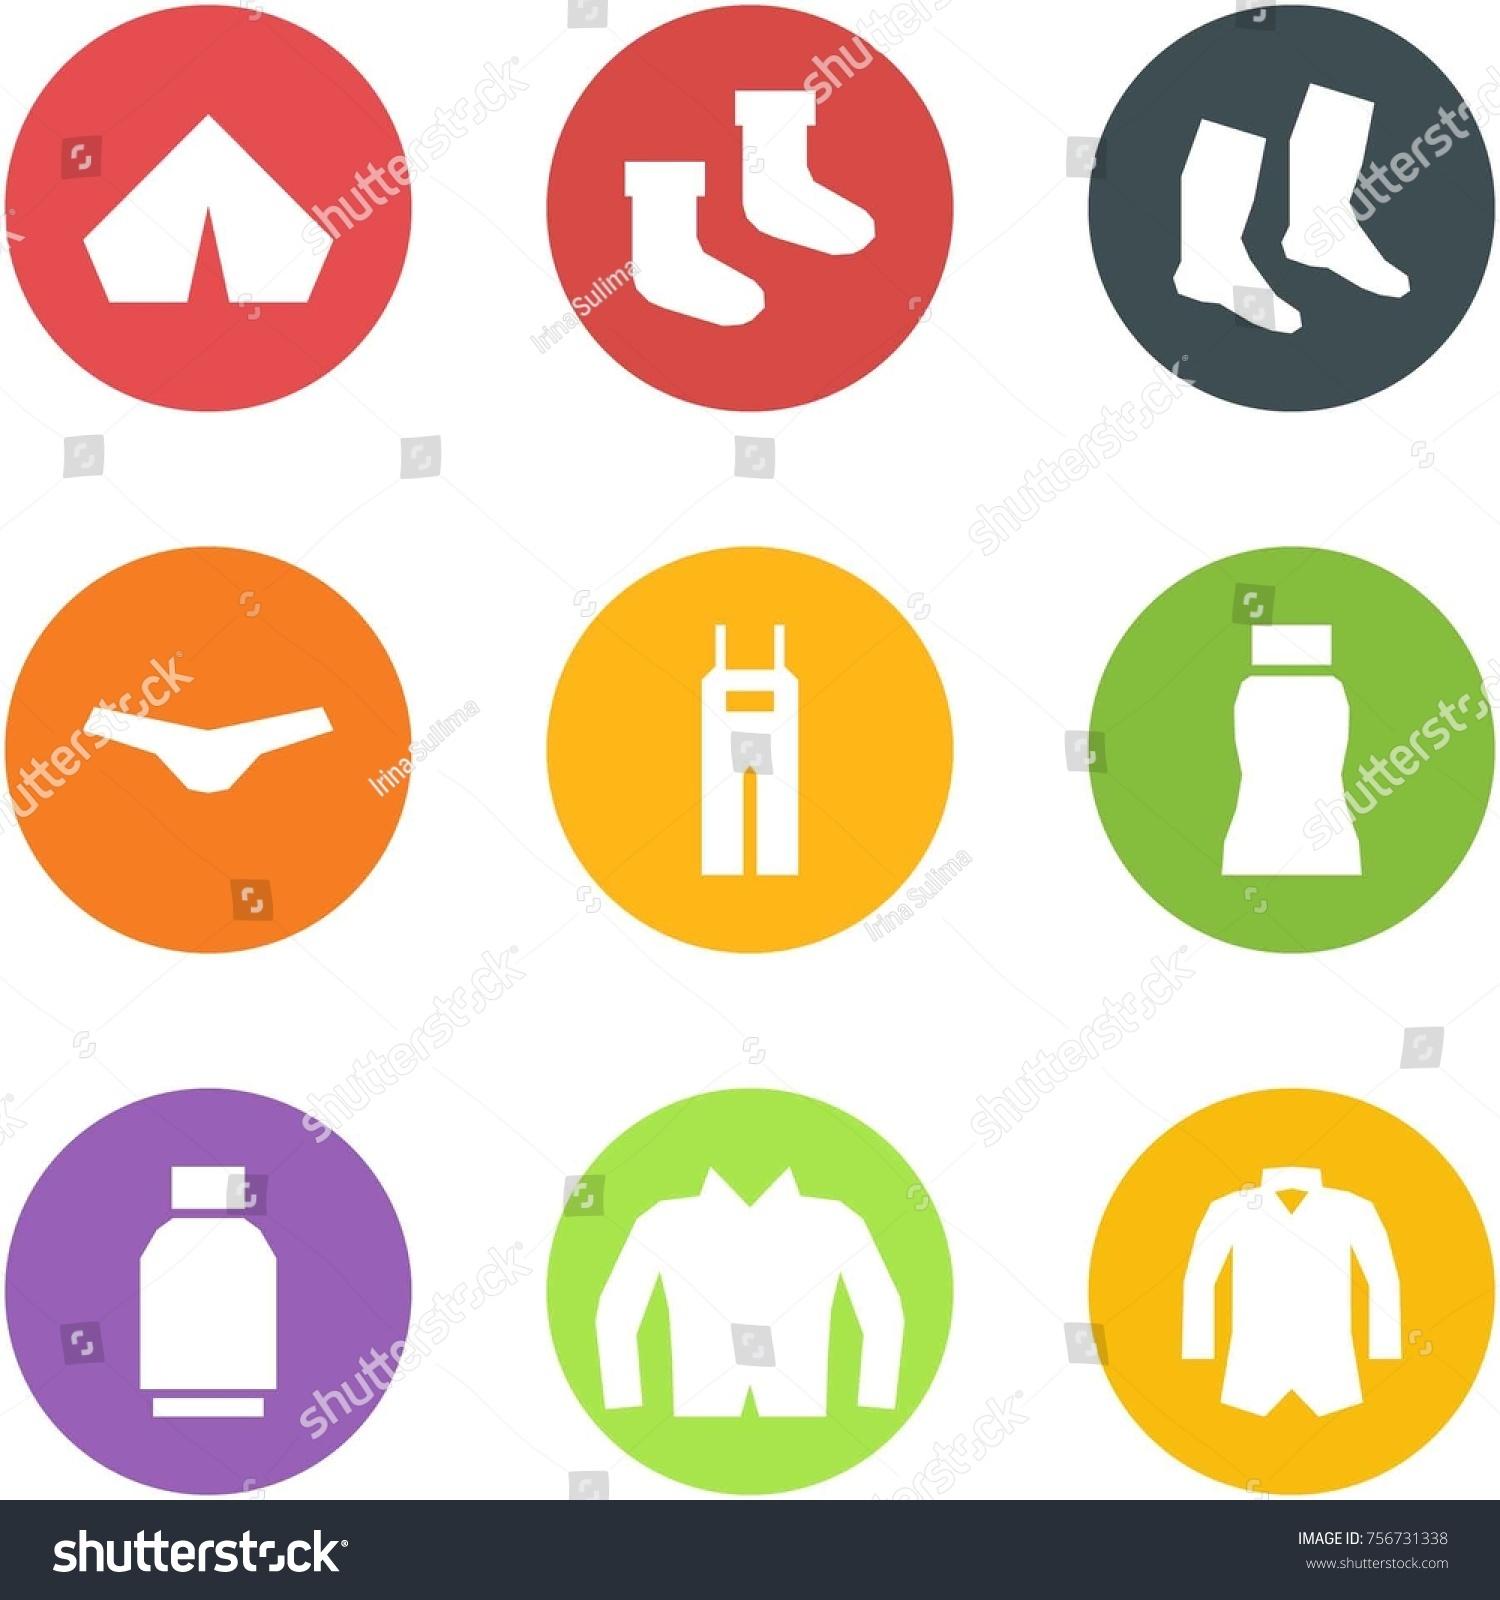 Origami corner style icon set - tent socks  underpants overalls skirt  sc 1 st  Shutterstock & Origami Corner Style Icon Set Tent Stock Vector 756731338 ...